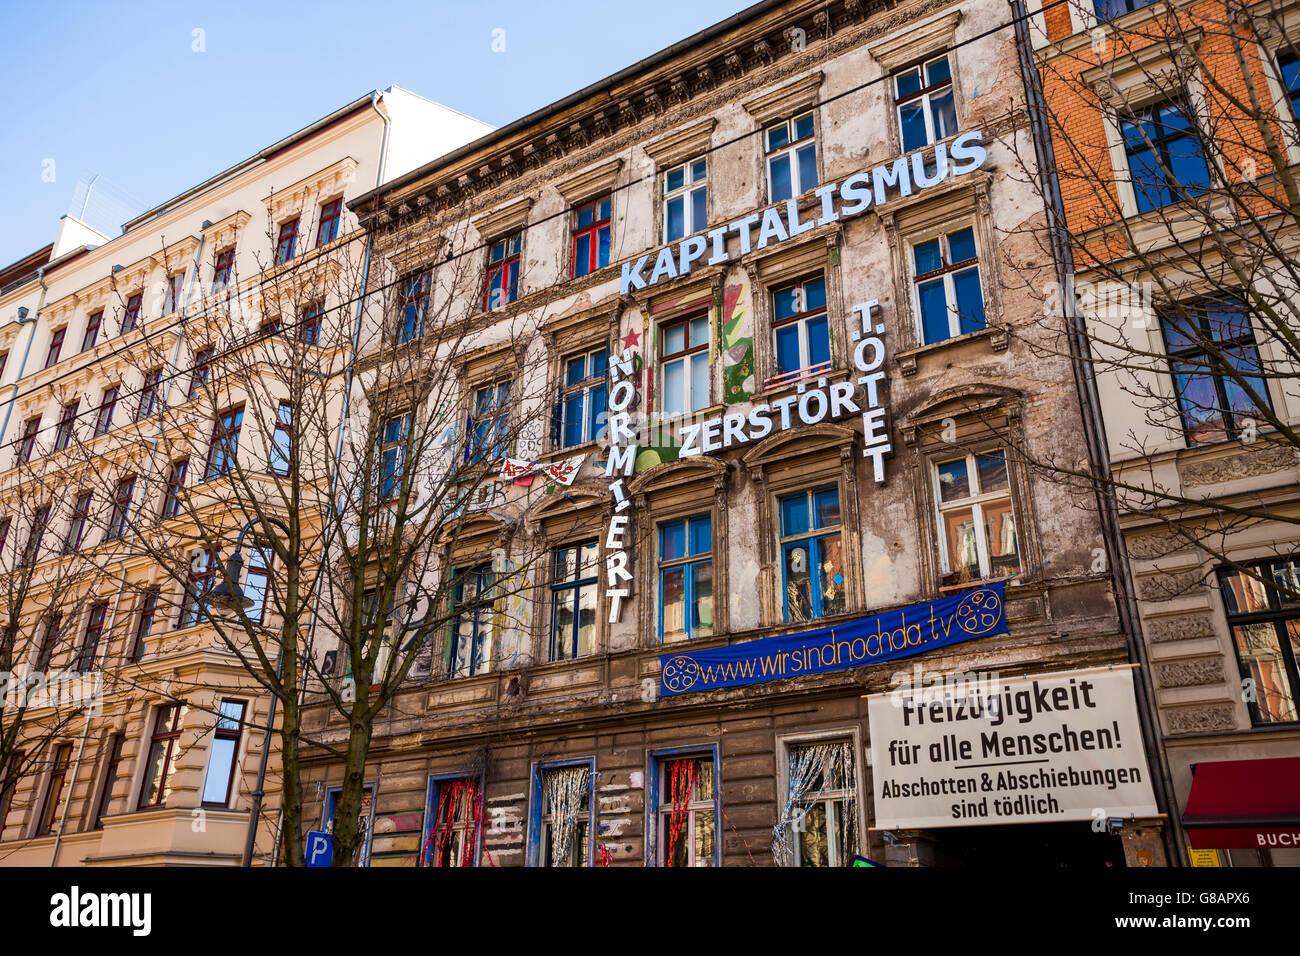 Anti-capitalist sign on the Kastanienallee 86, Berlin, Germany - Stock Image